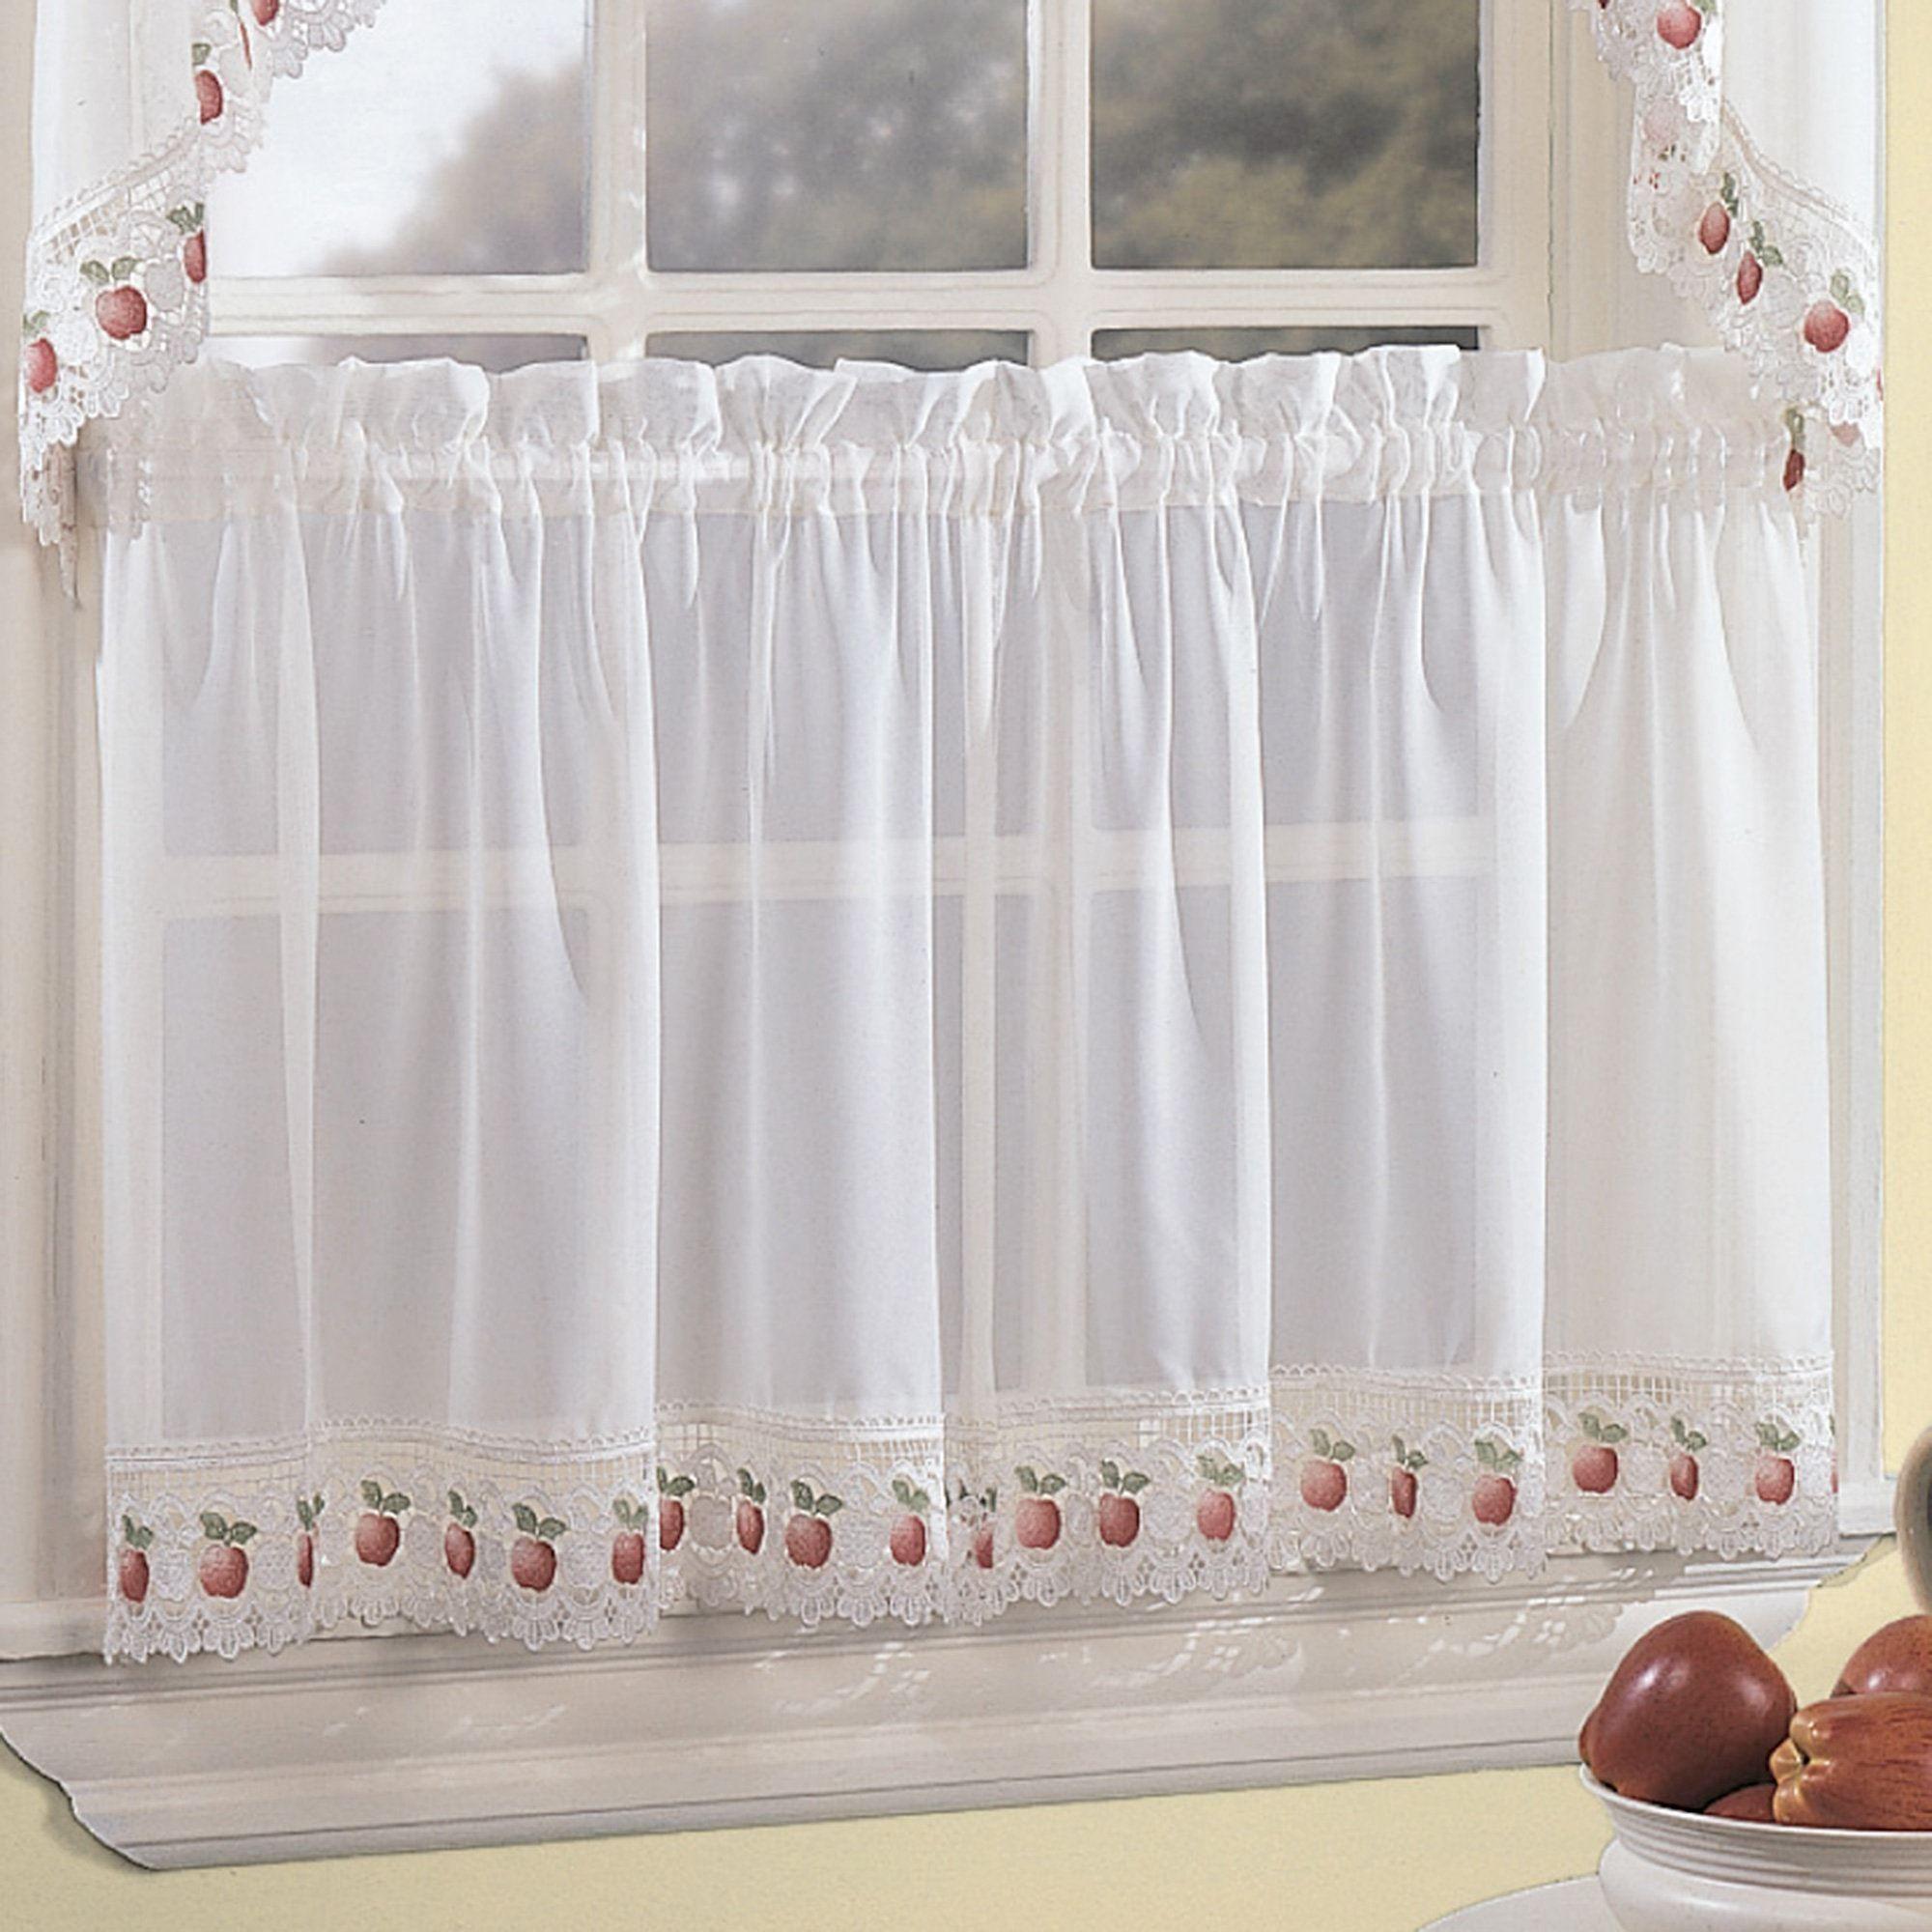 Orchard window curtain tiers realtagfo pinterest